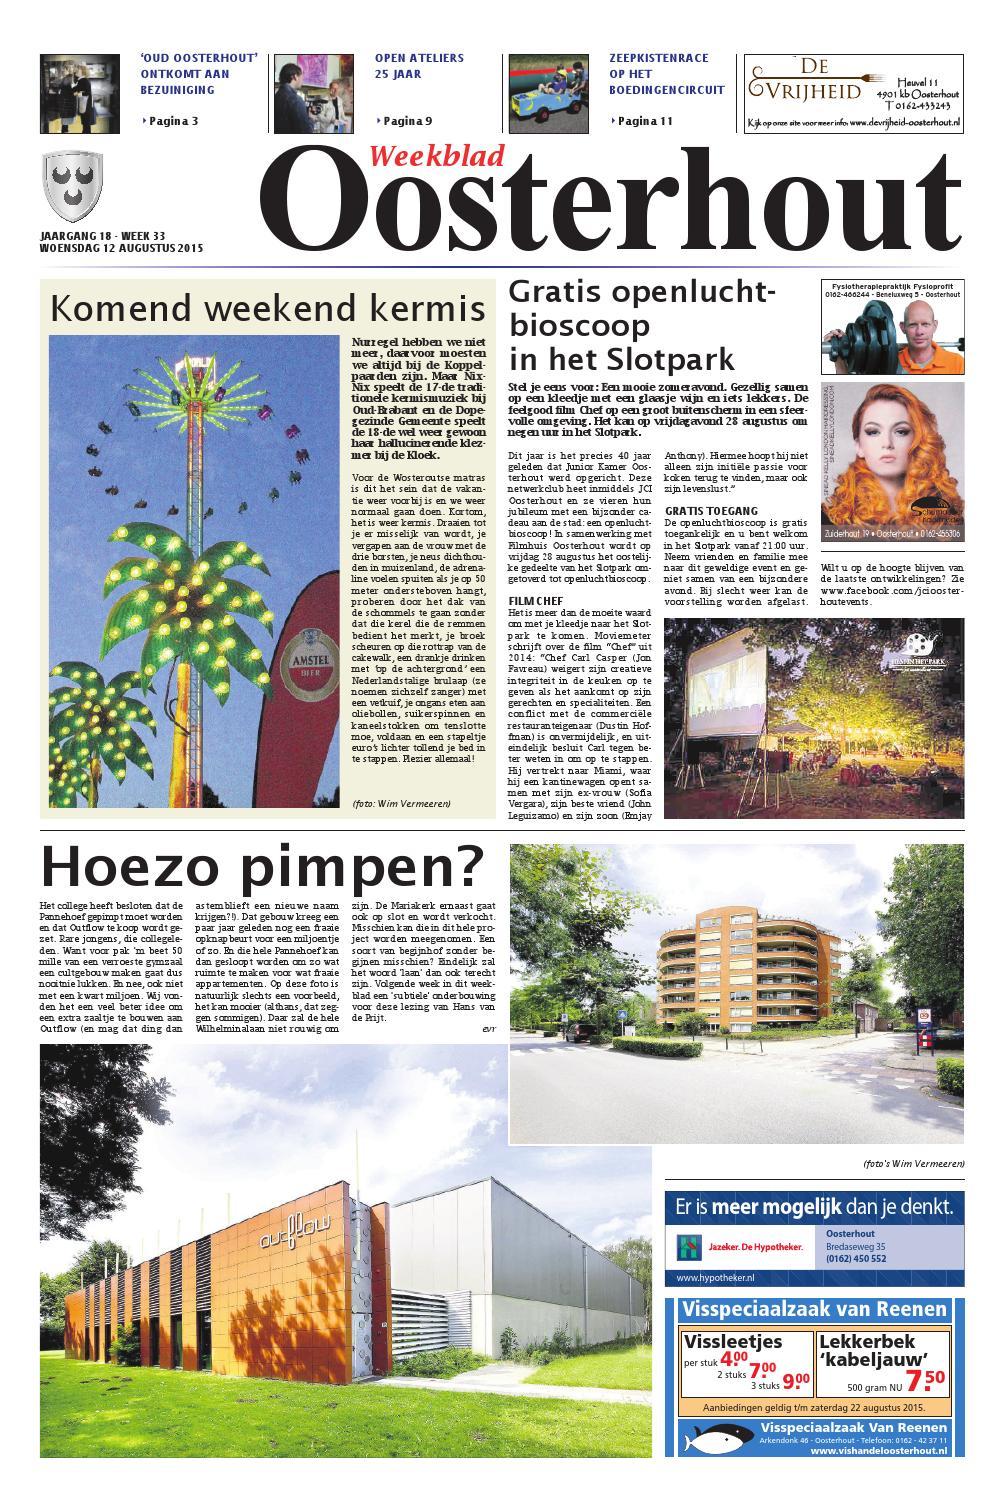 Weekblad Oosterhout 12 08 2015 By Uitgeverij Em De Jong Issuu